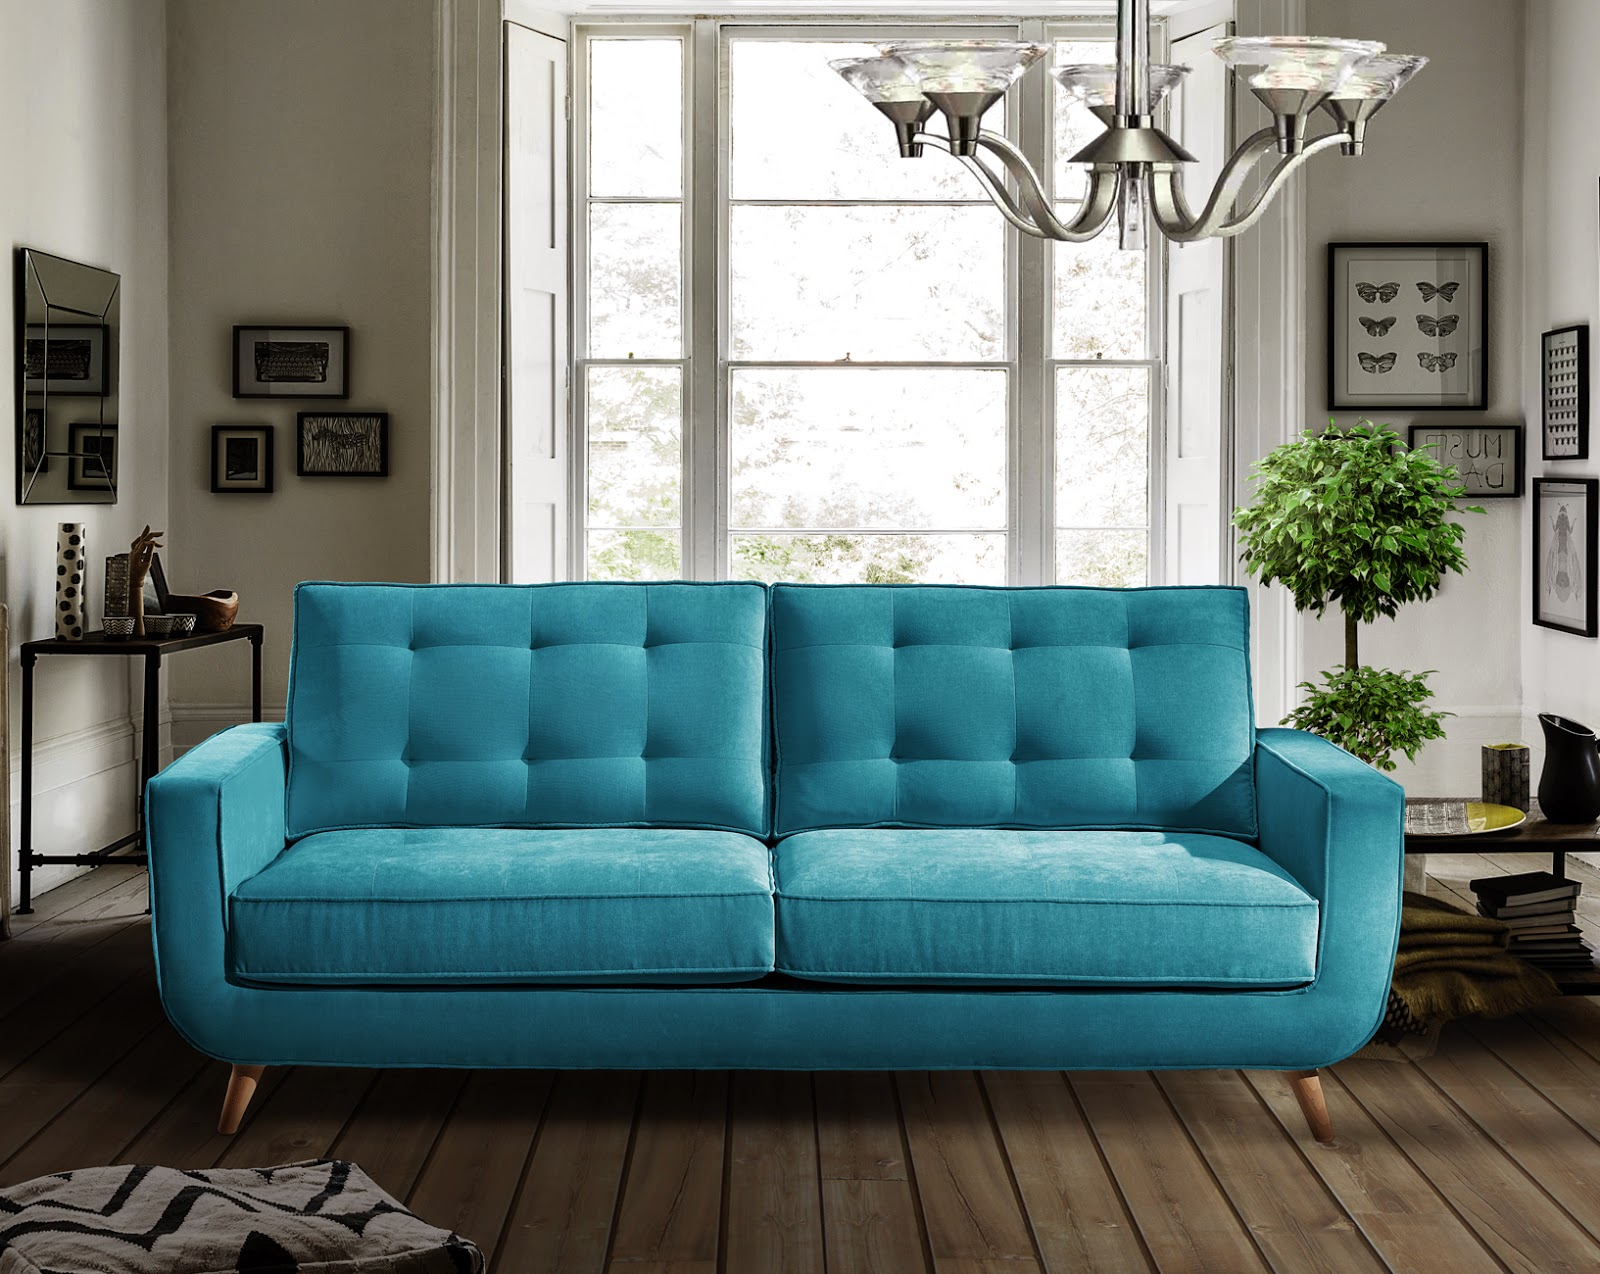 http://www.portobellostreet.es/mueble/33612/Sofa-Sterling-Cooper-Retro-Turquesa